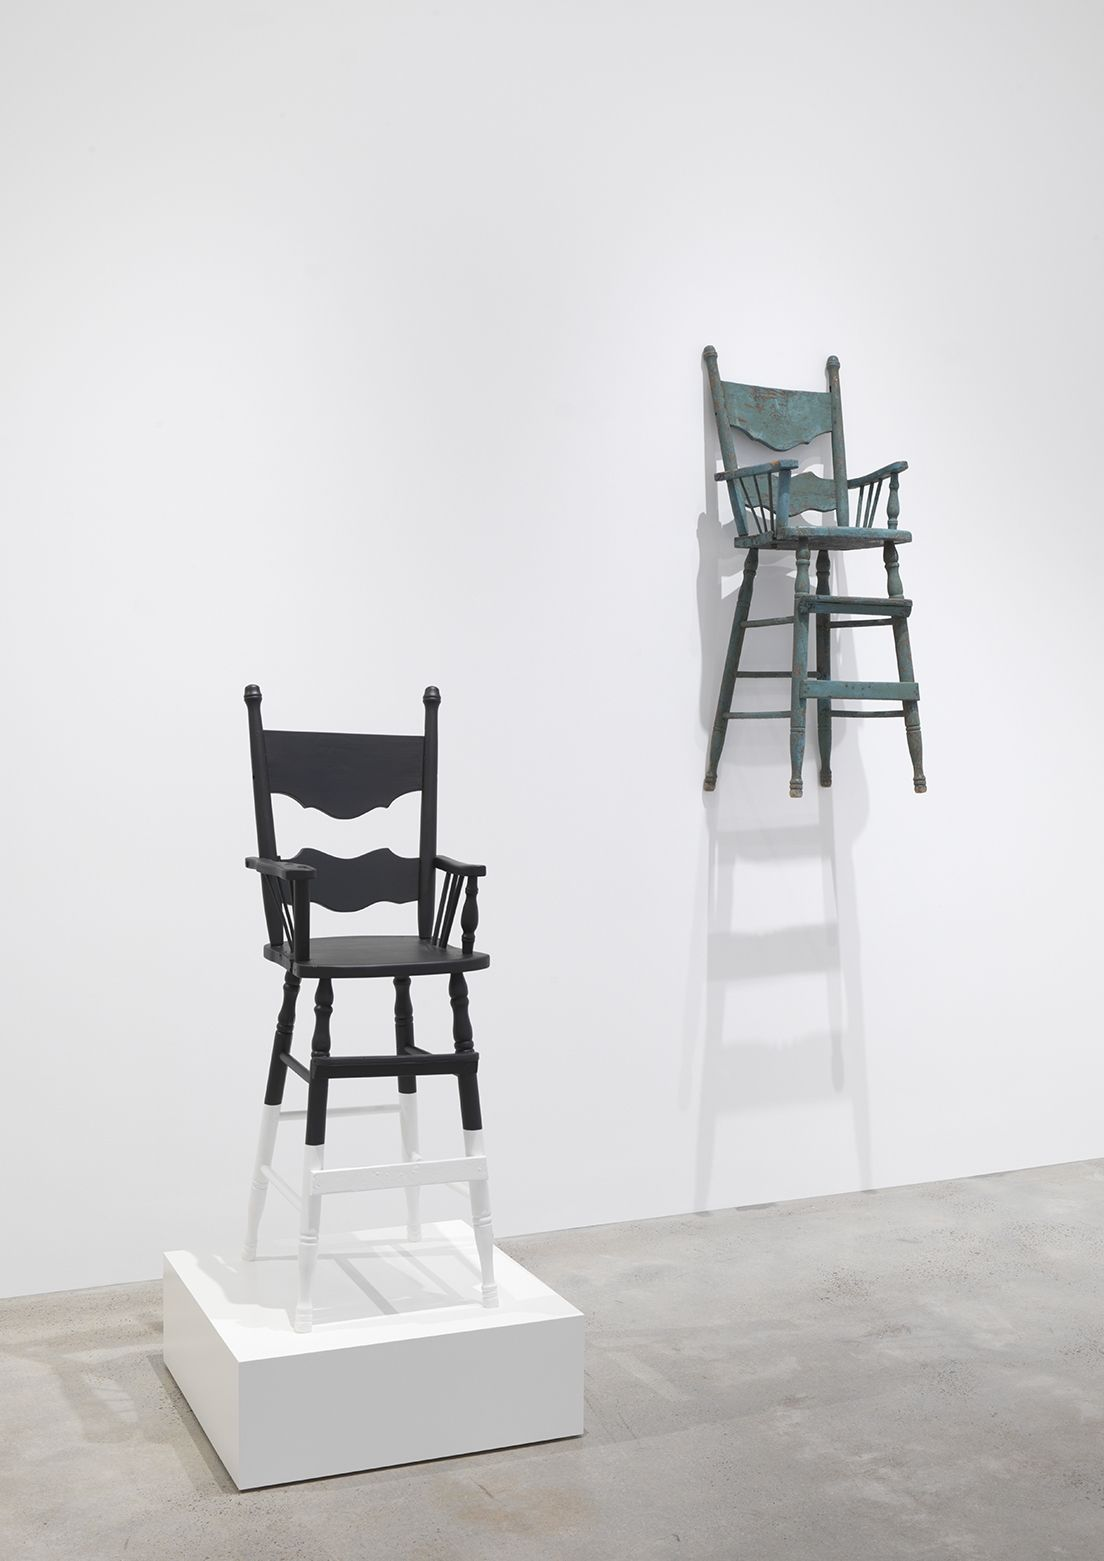 Roy McMakin, Untitled, 2013